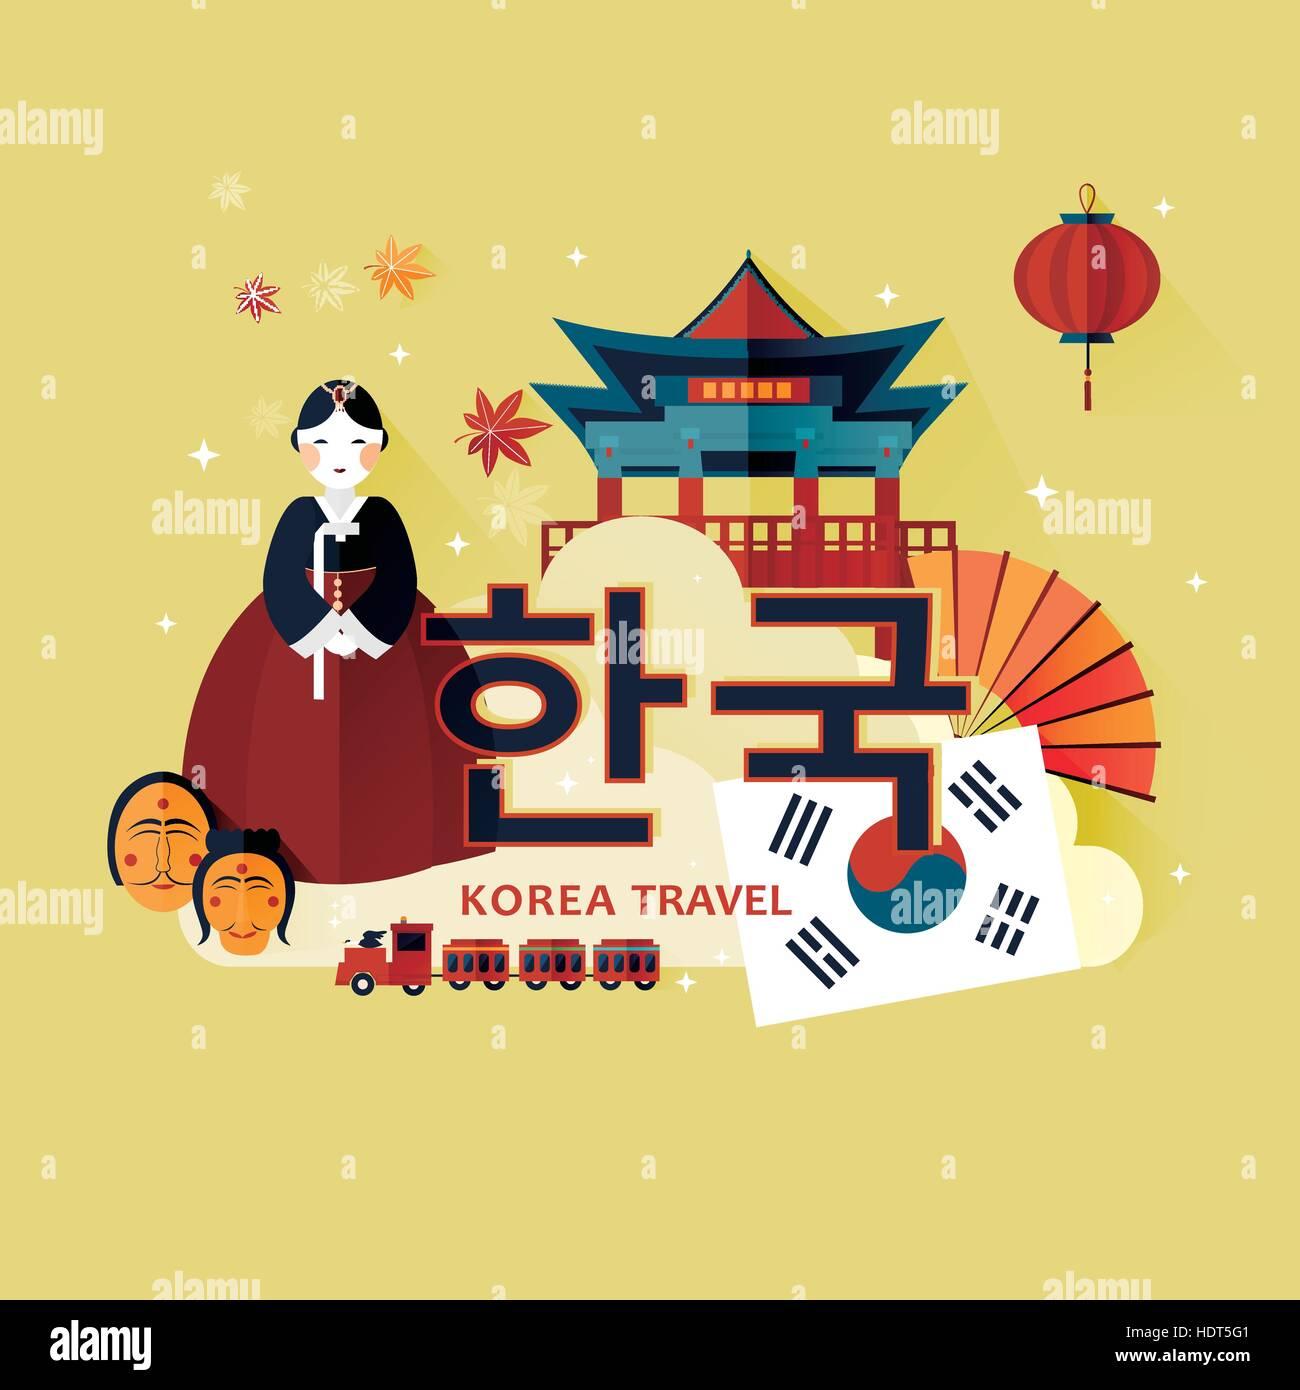 Korean poster design -  Traditional Korean Culture Symbol In Travel Poster Korea In Korean Words In The Middle